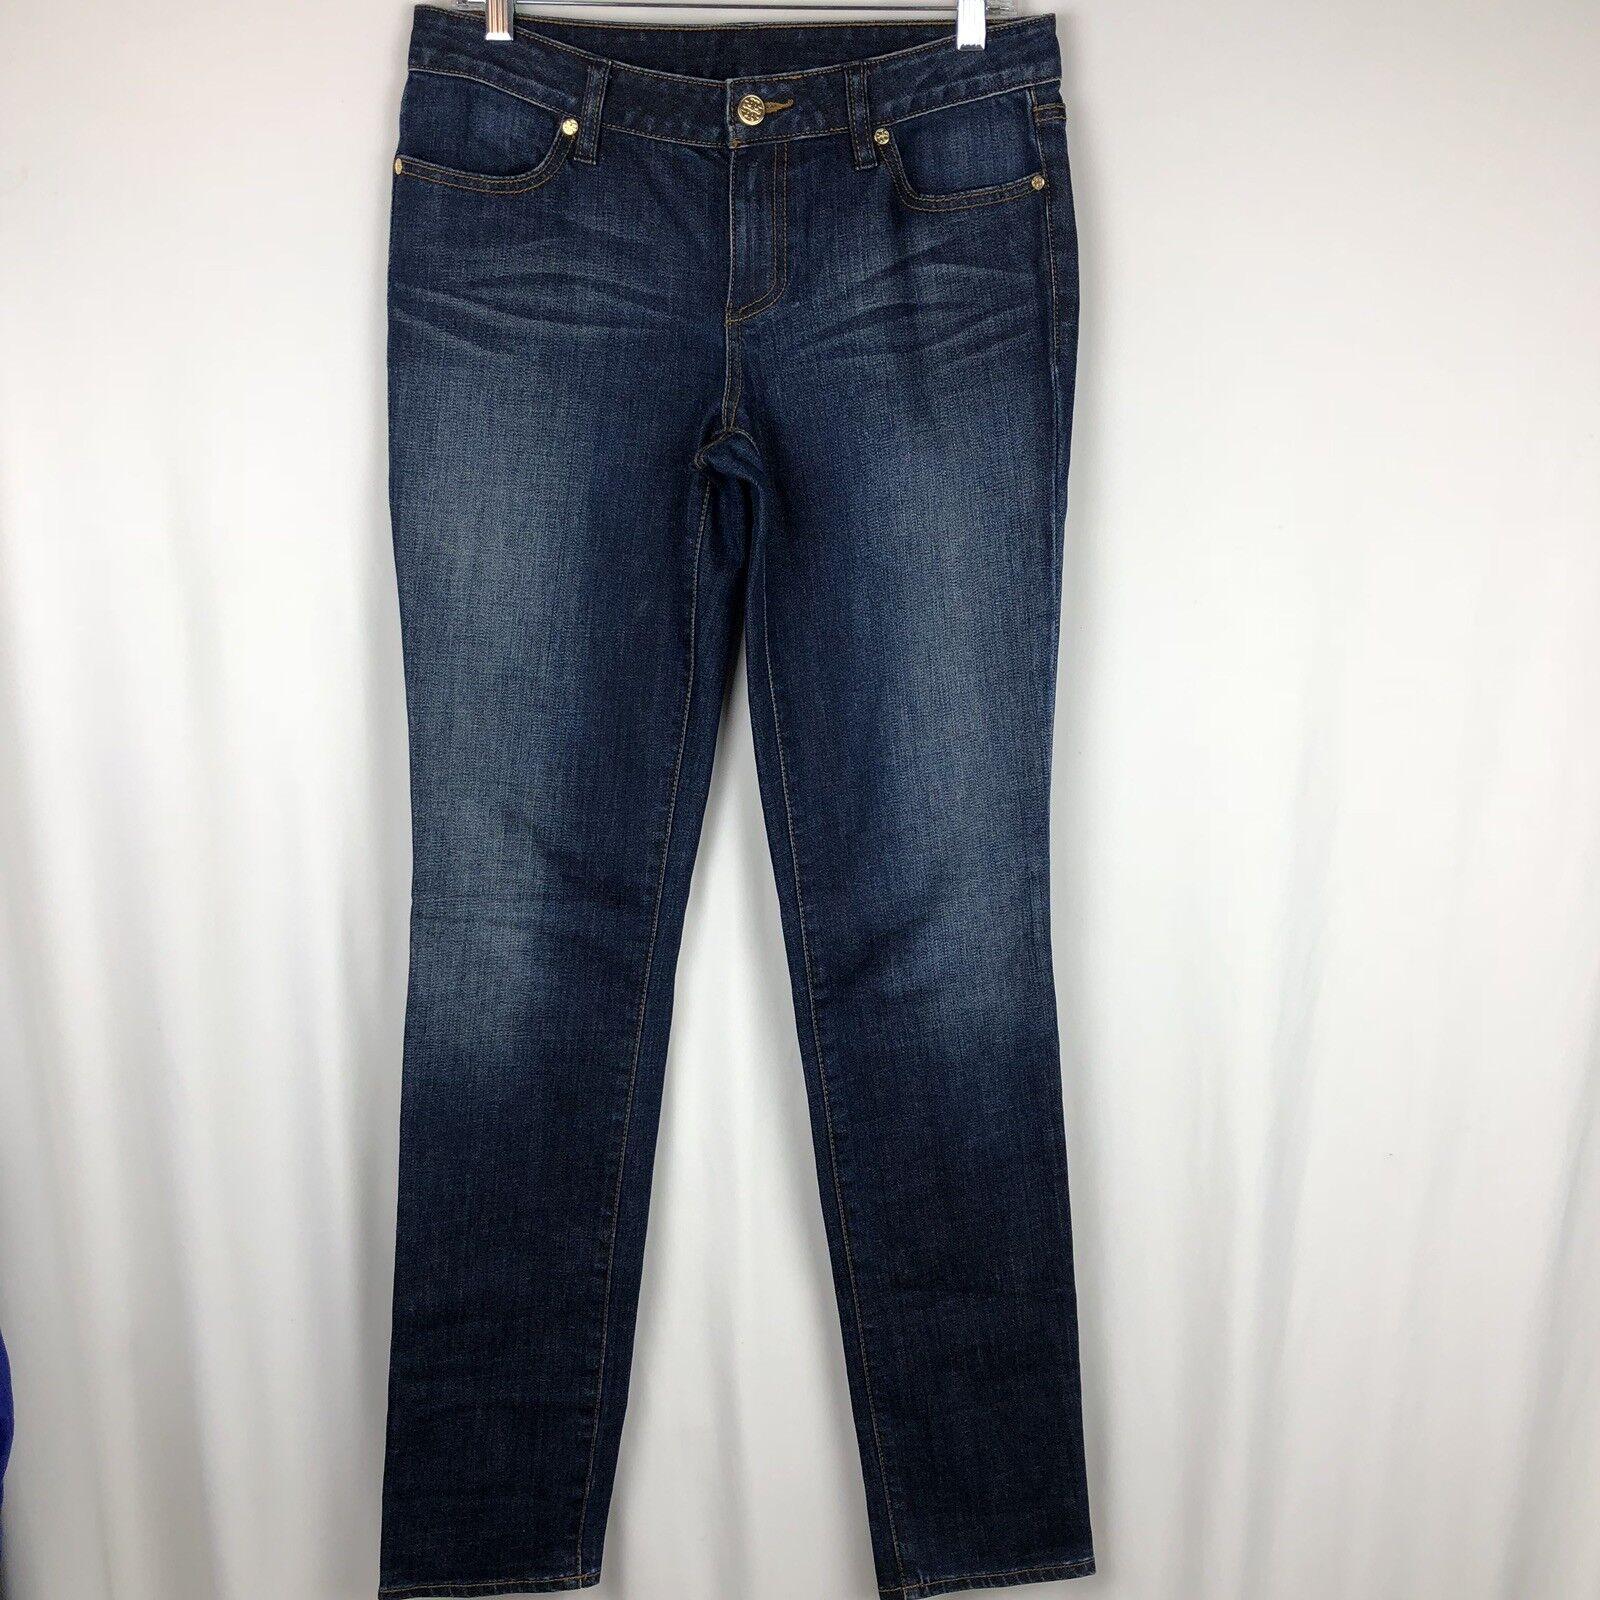 Tory Burch Women's Super Skinny Jeans size 29 Dark Wash